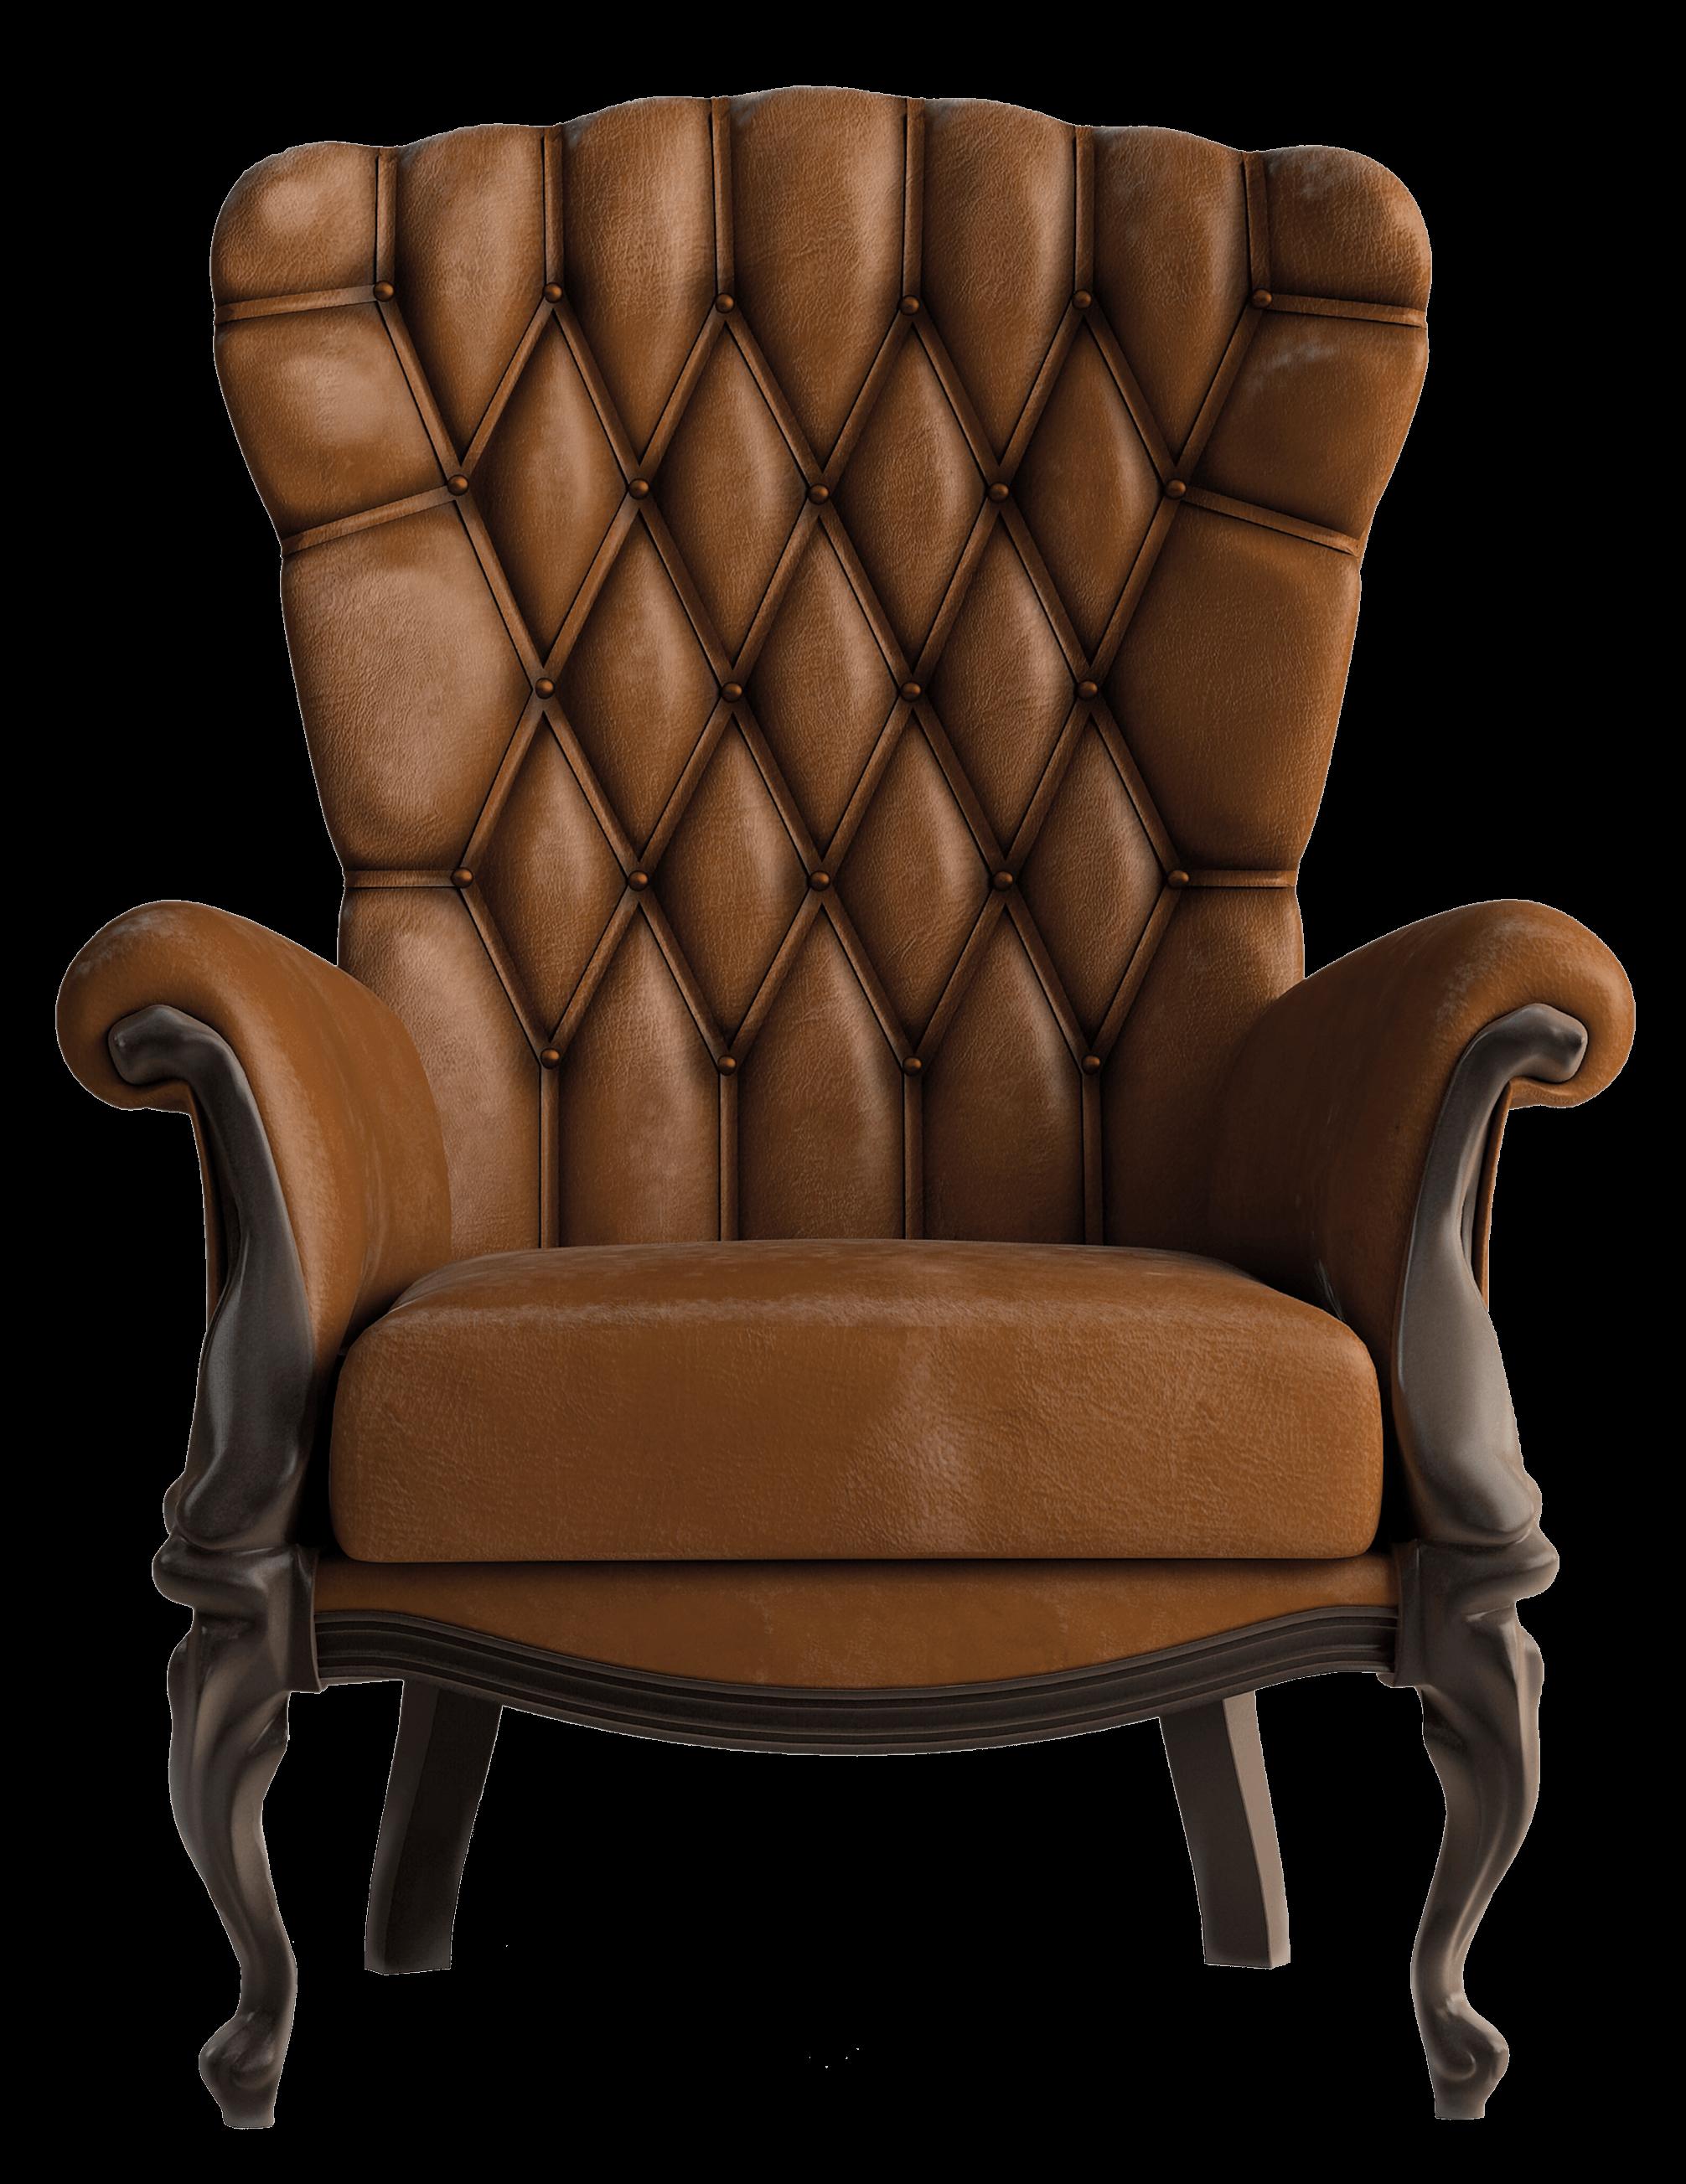 Armchair Vintage Brown transparent PNG StickPNG